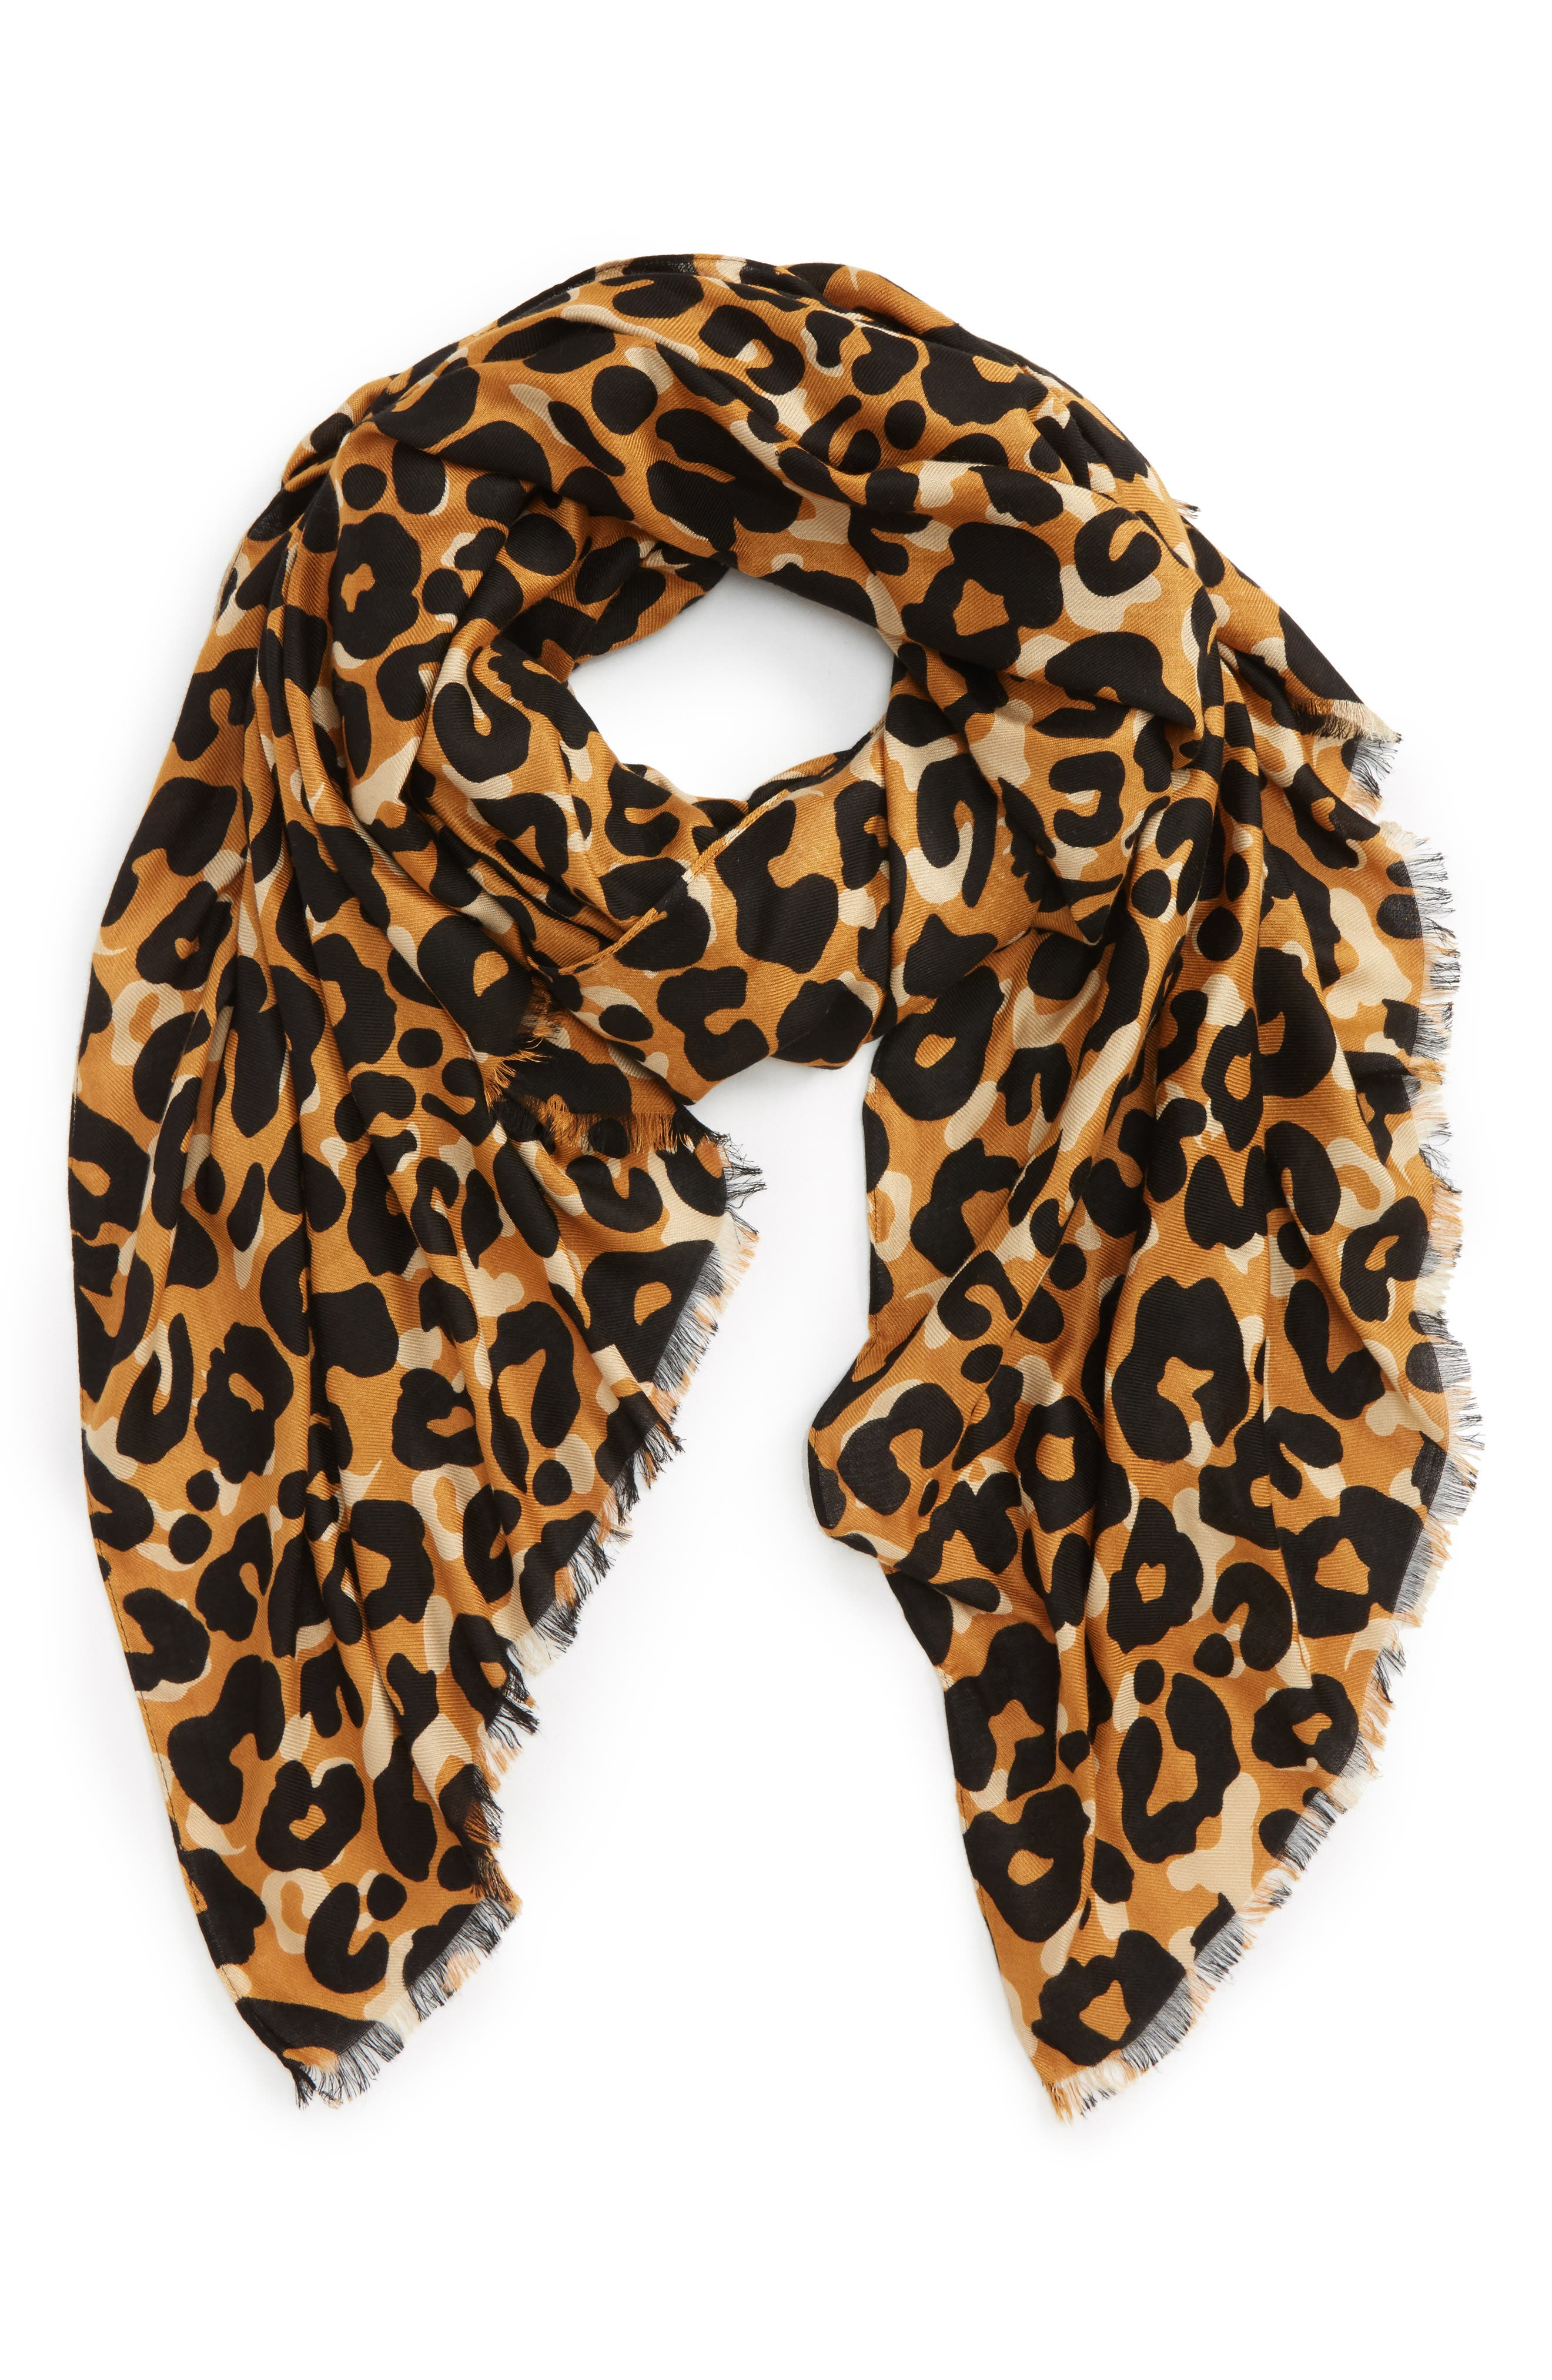 Sole Society Cheetah Print Scarf